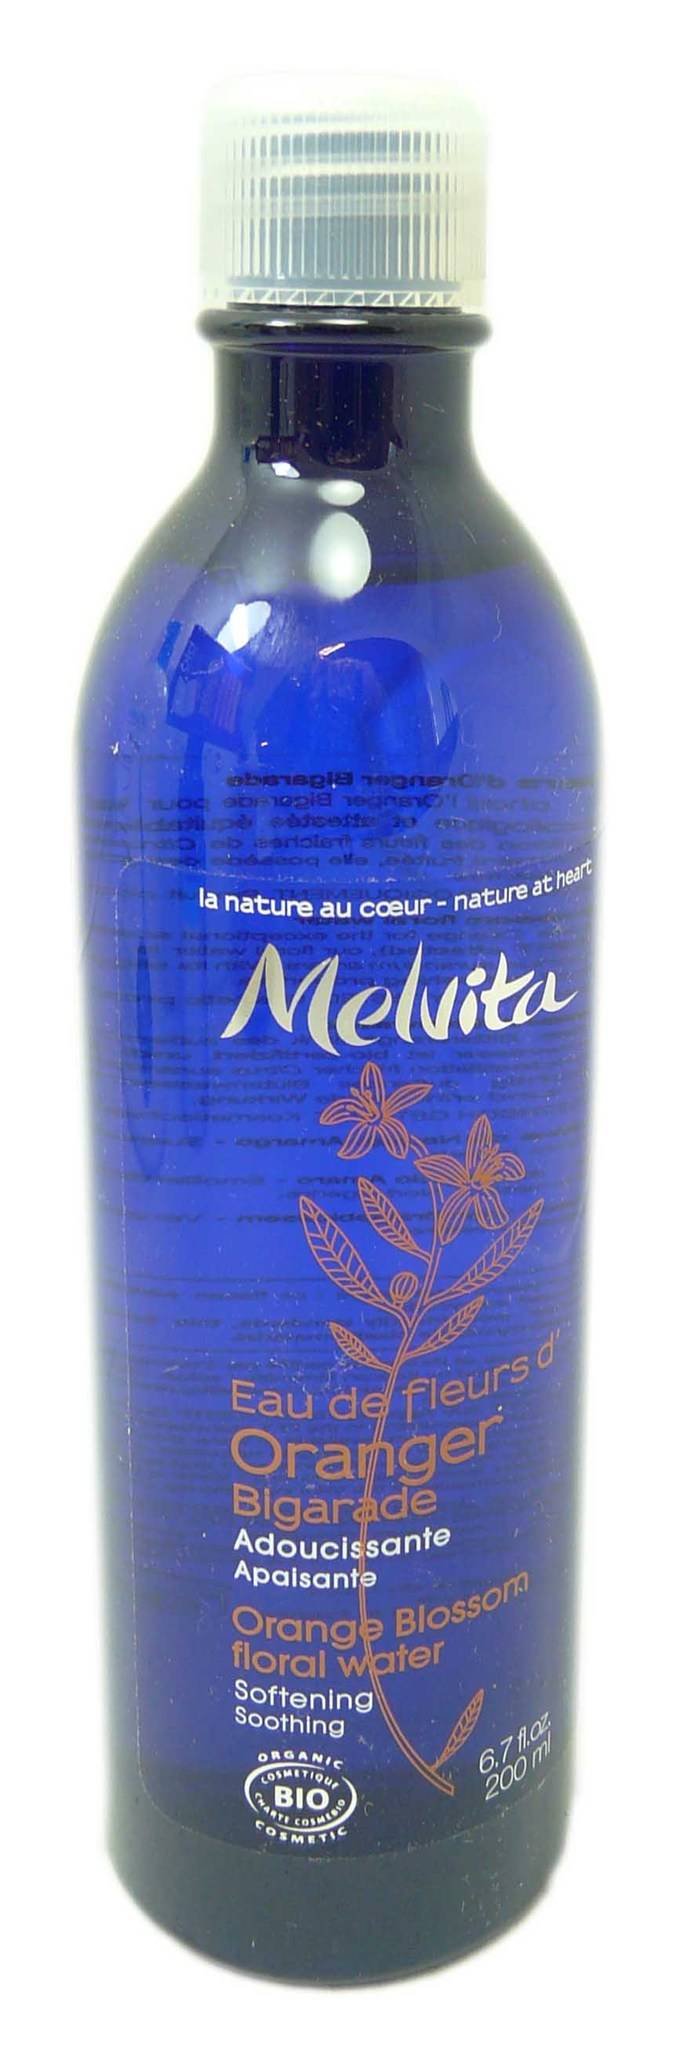 Melvita eau de fleur d'oranger fl200ml